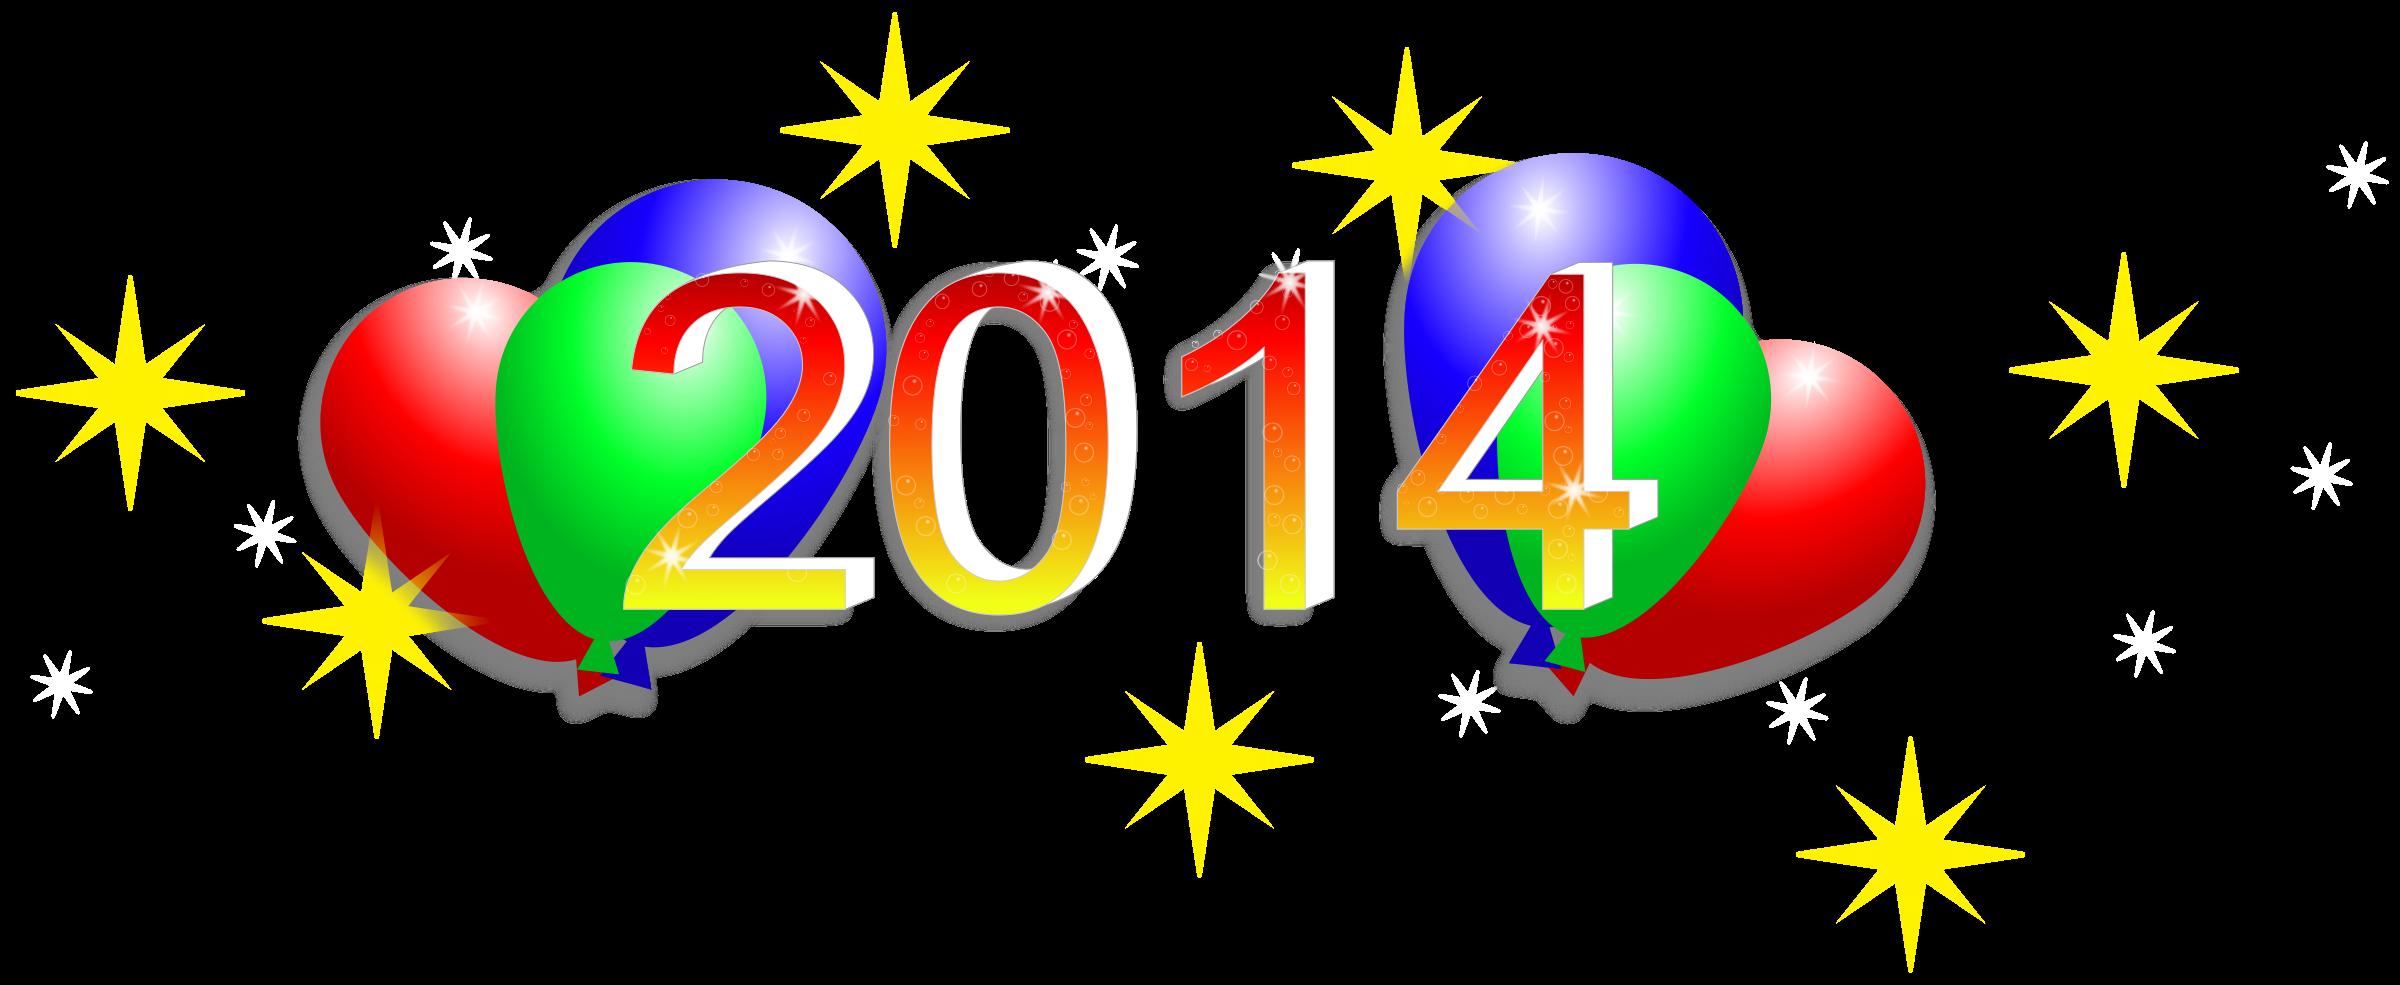 Calendar panda images. Free clipart new year